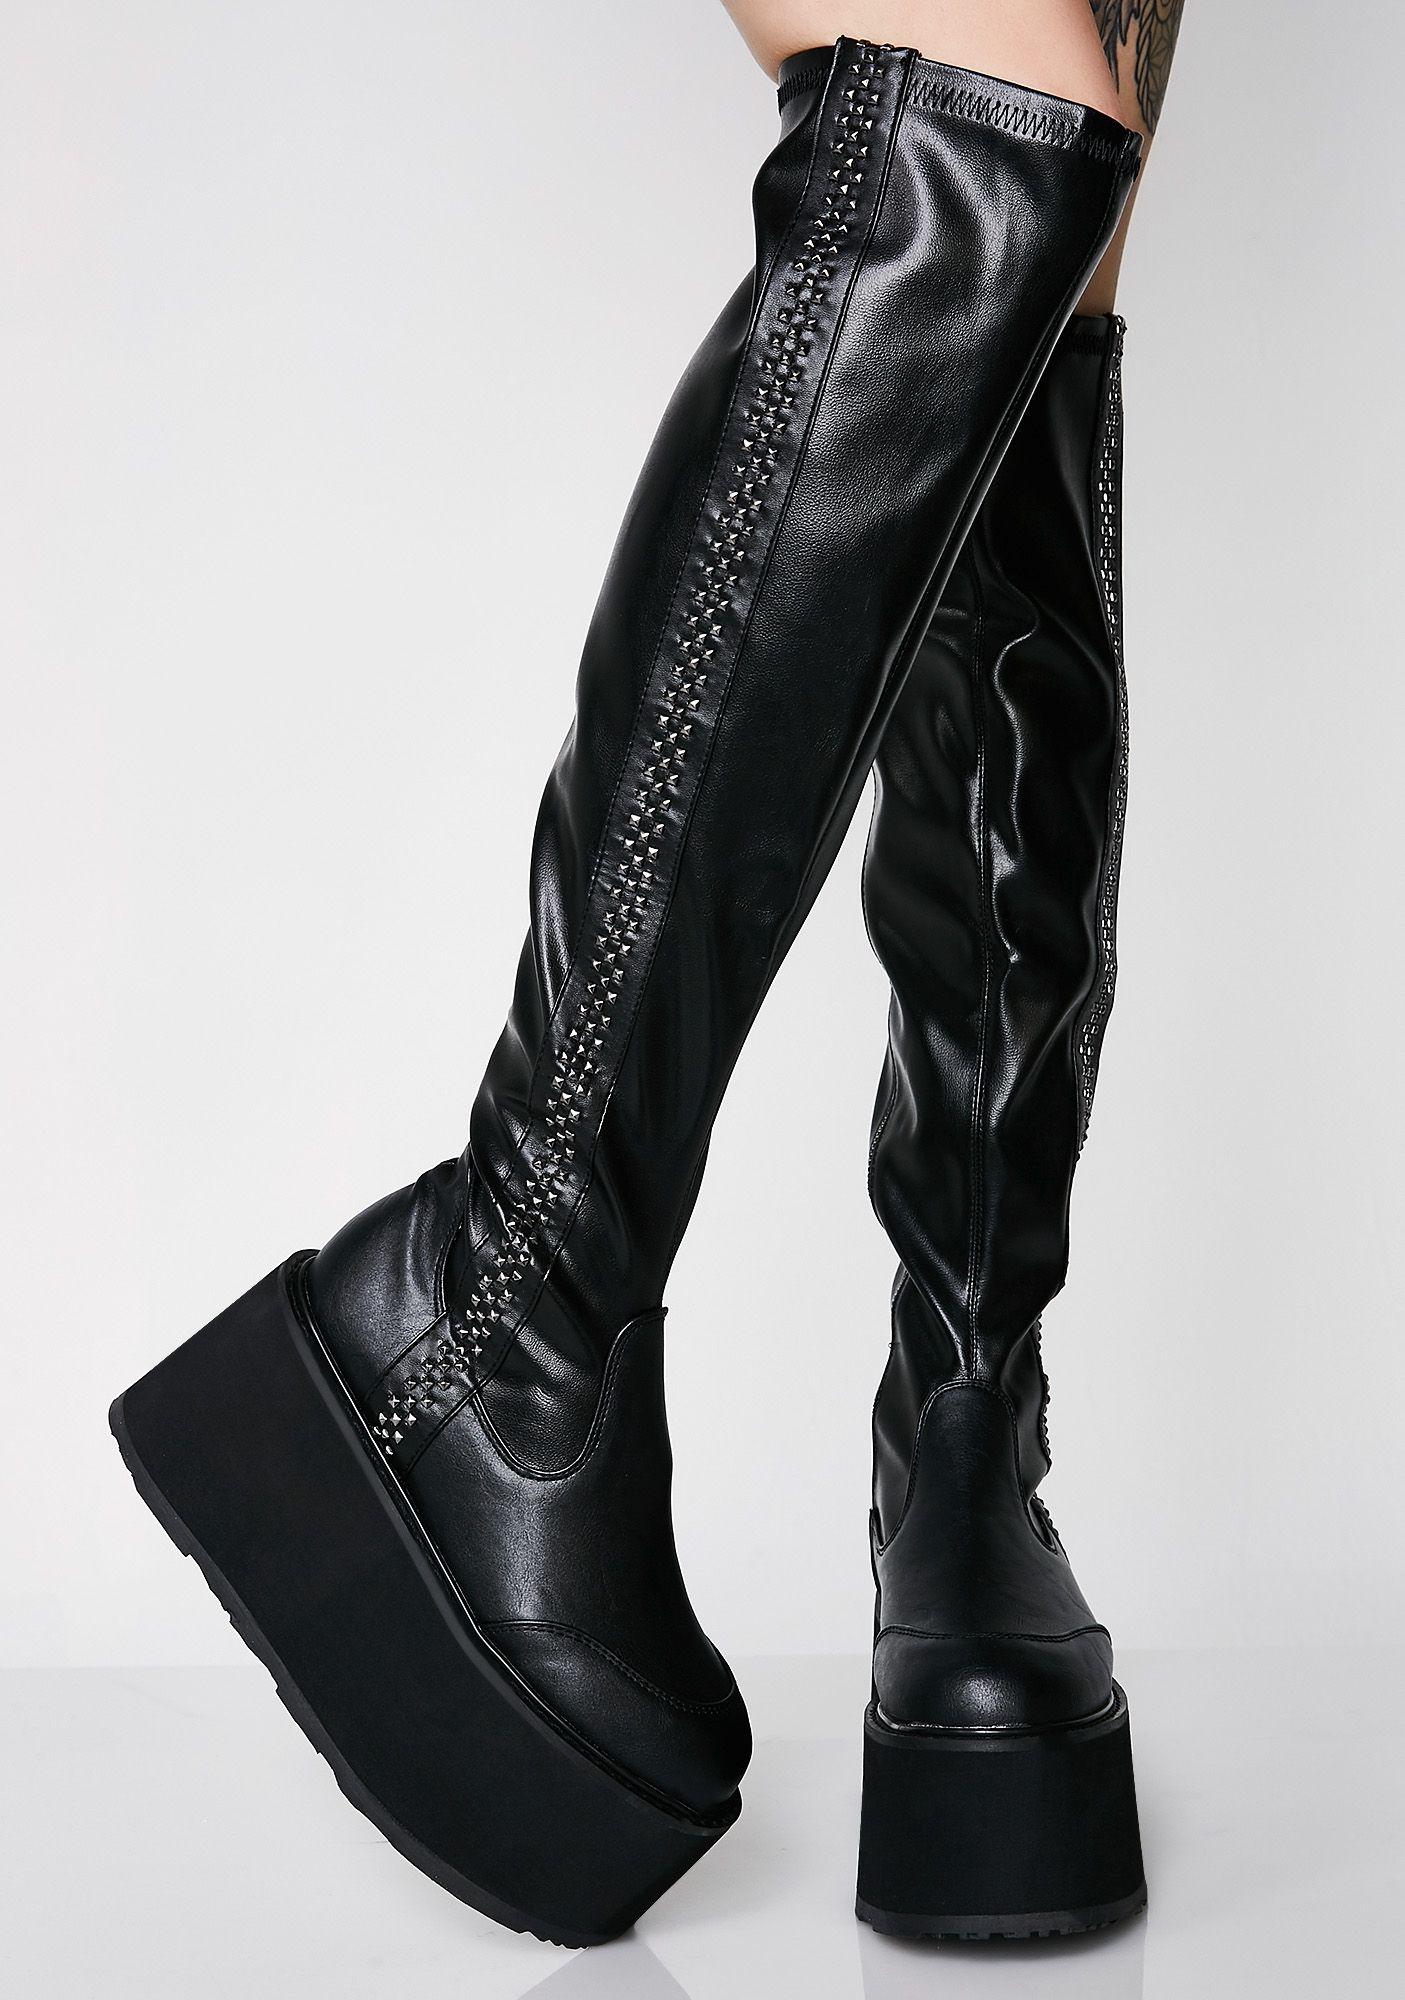 b3ac354cba22 Demonia Stompin  Hard Platform Goth Boots